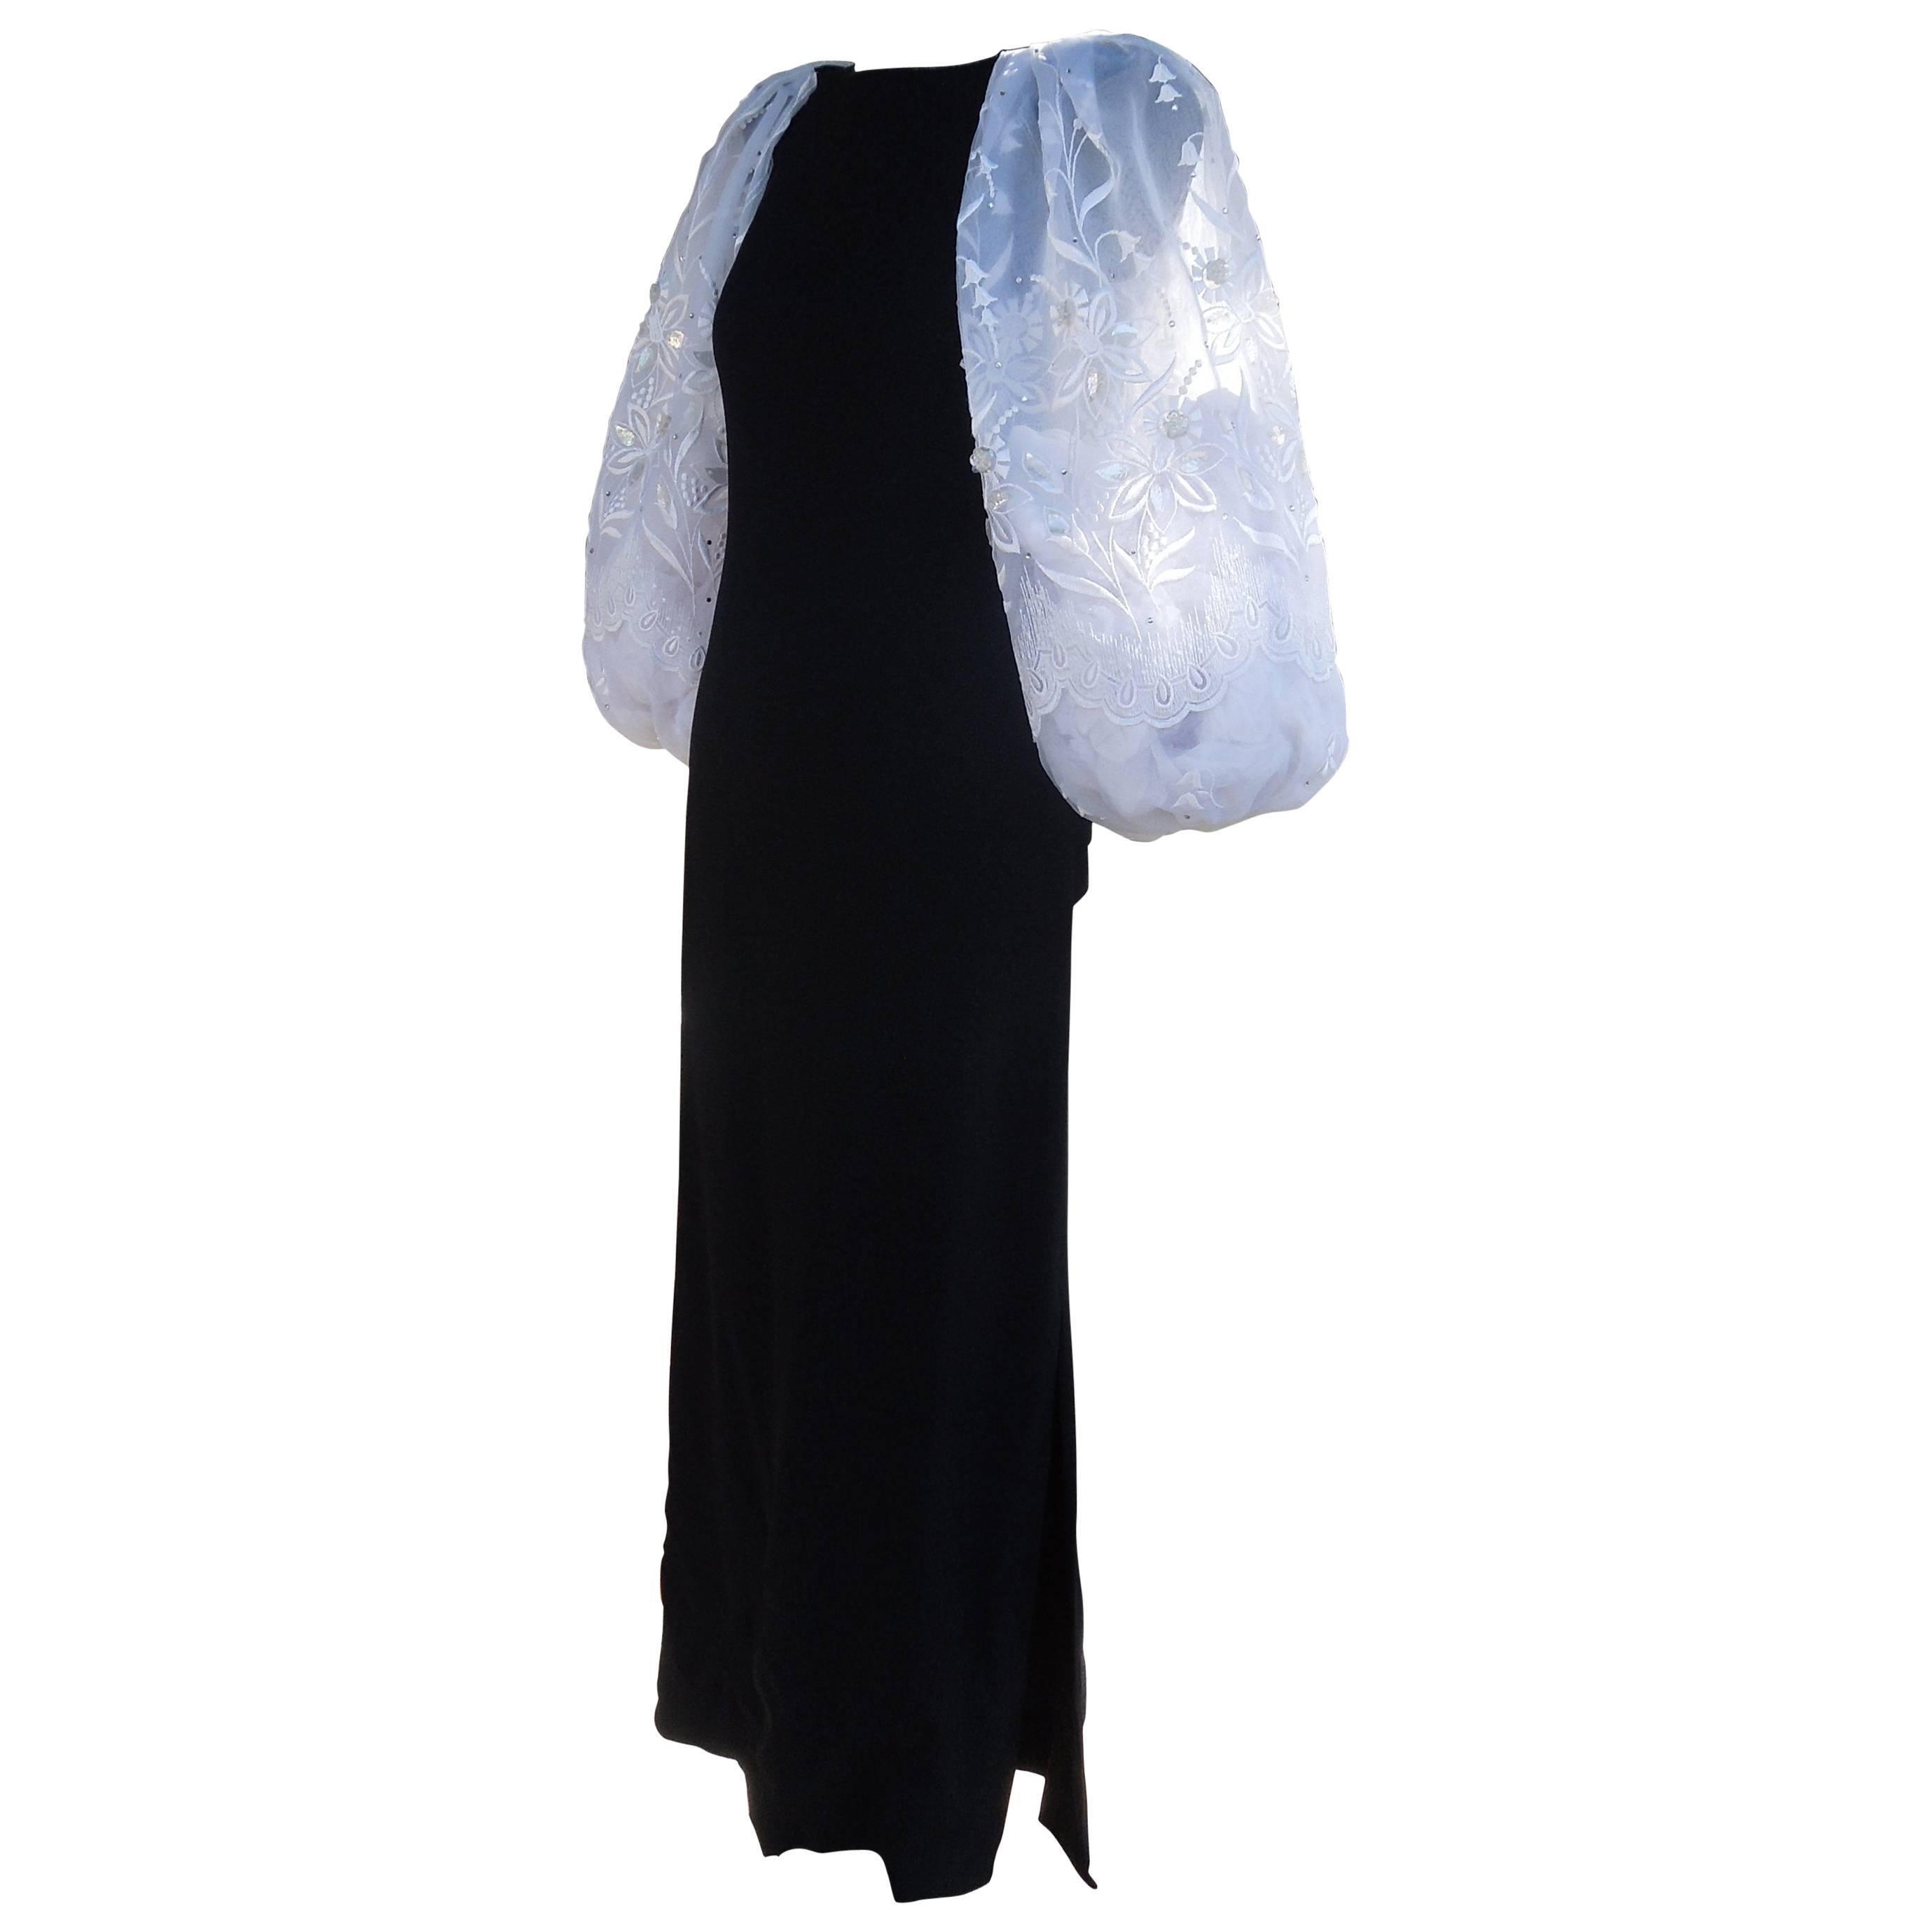 Richilene New York Beaded Organza Sleeve Black Crepe Evening Dress